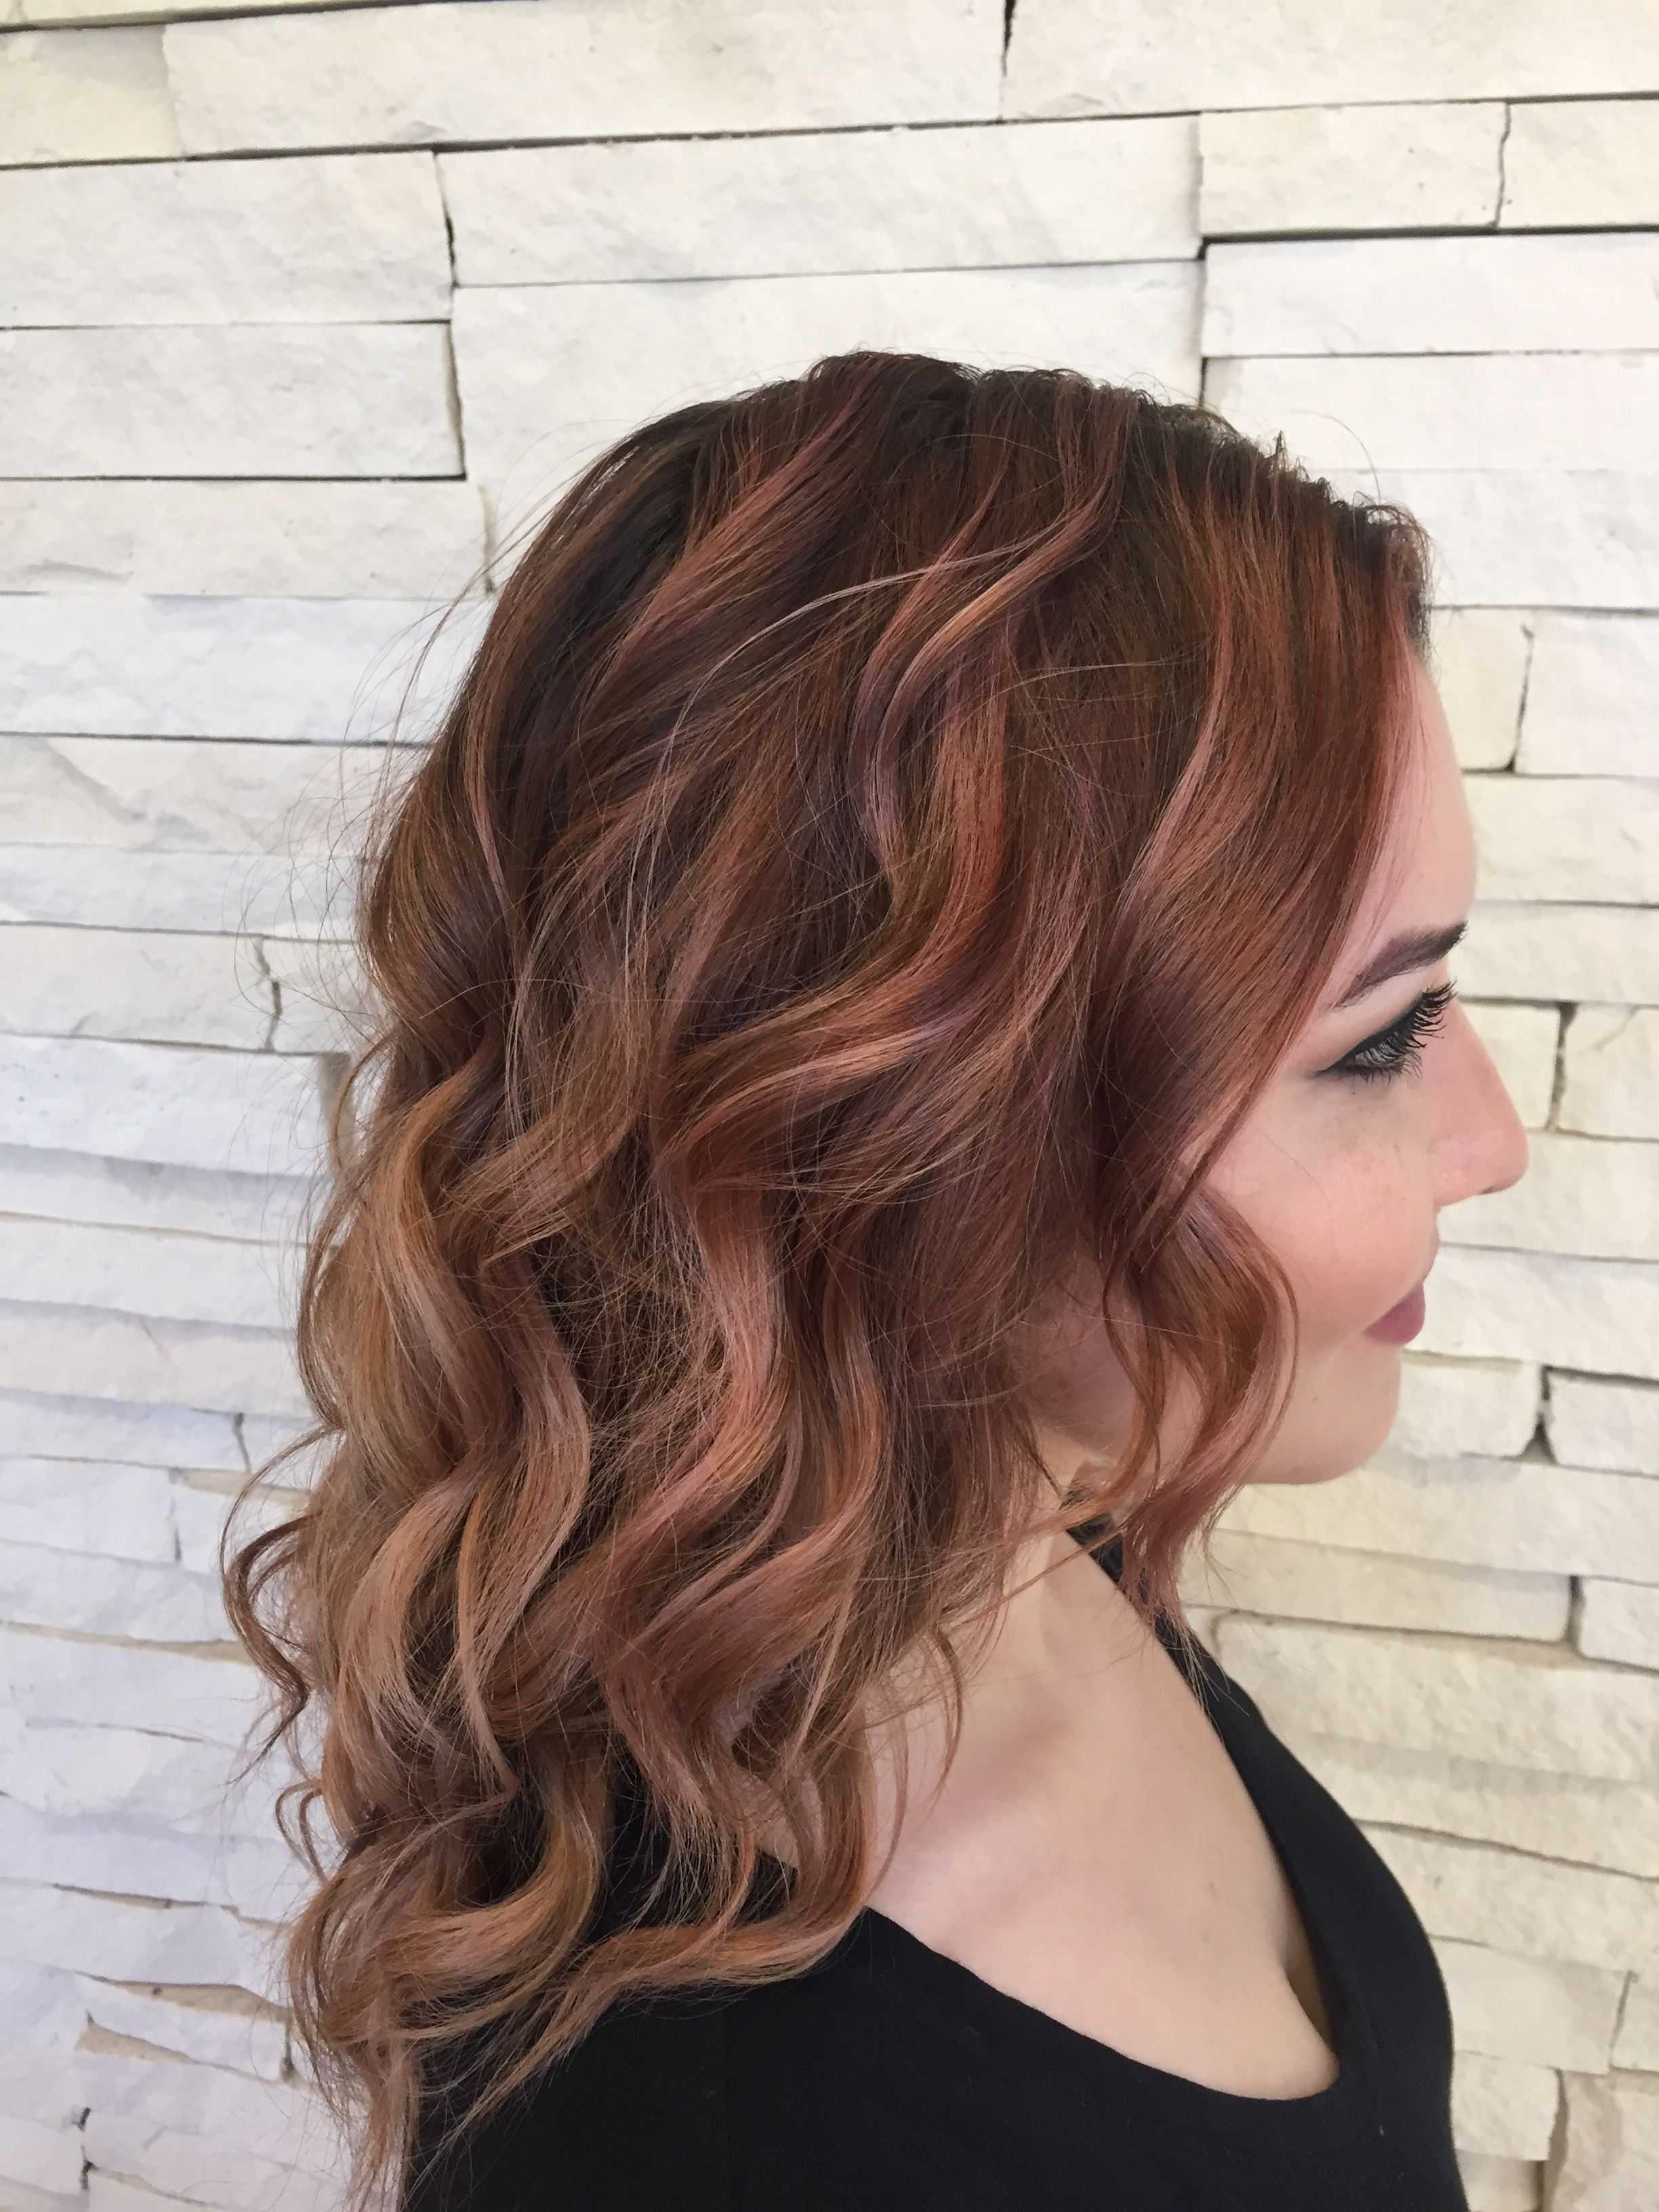 Rose Gold Balayage By Ashley Wilson At Jose Luis Salon Austin Tx Auburn Balayage Auburn Hair Hair